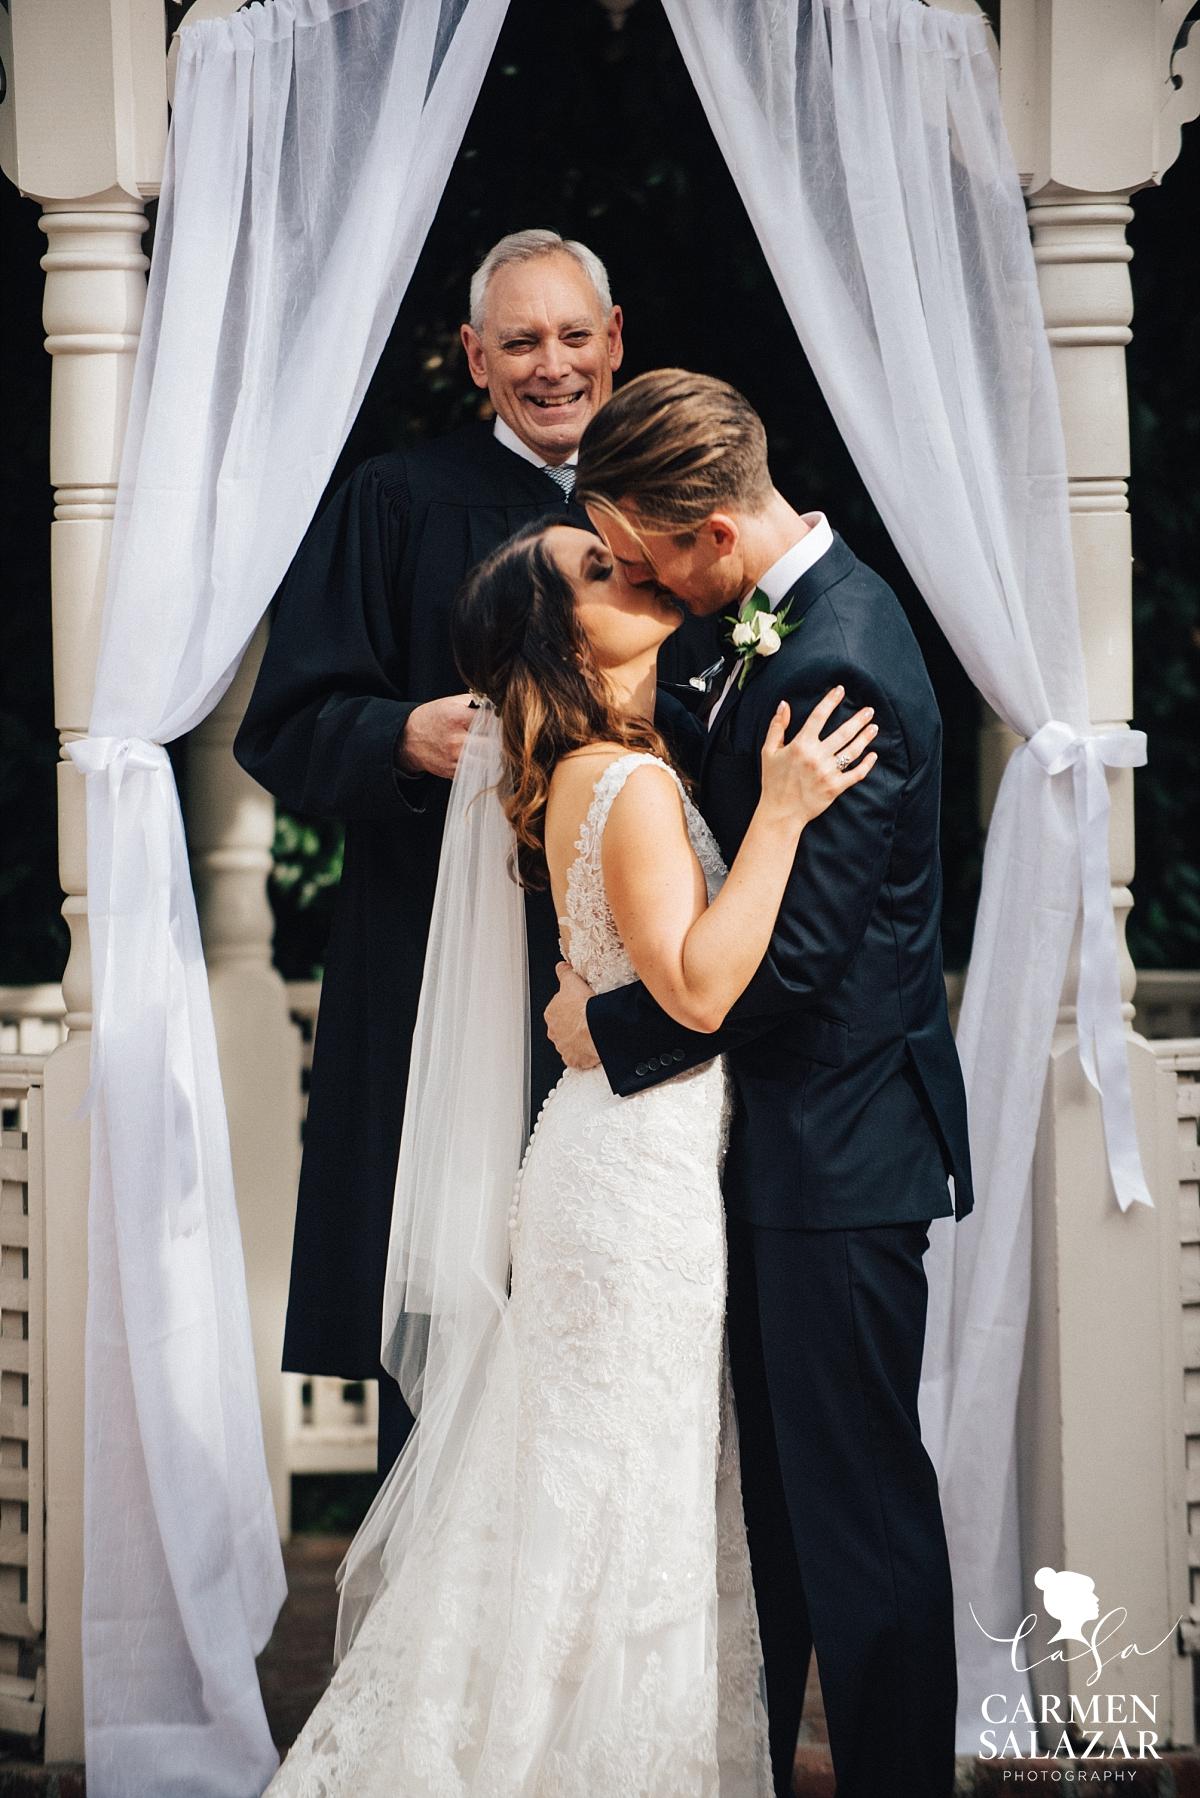 First kiss at Vizcaya summer wedding - Carmen Salazar